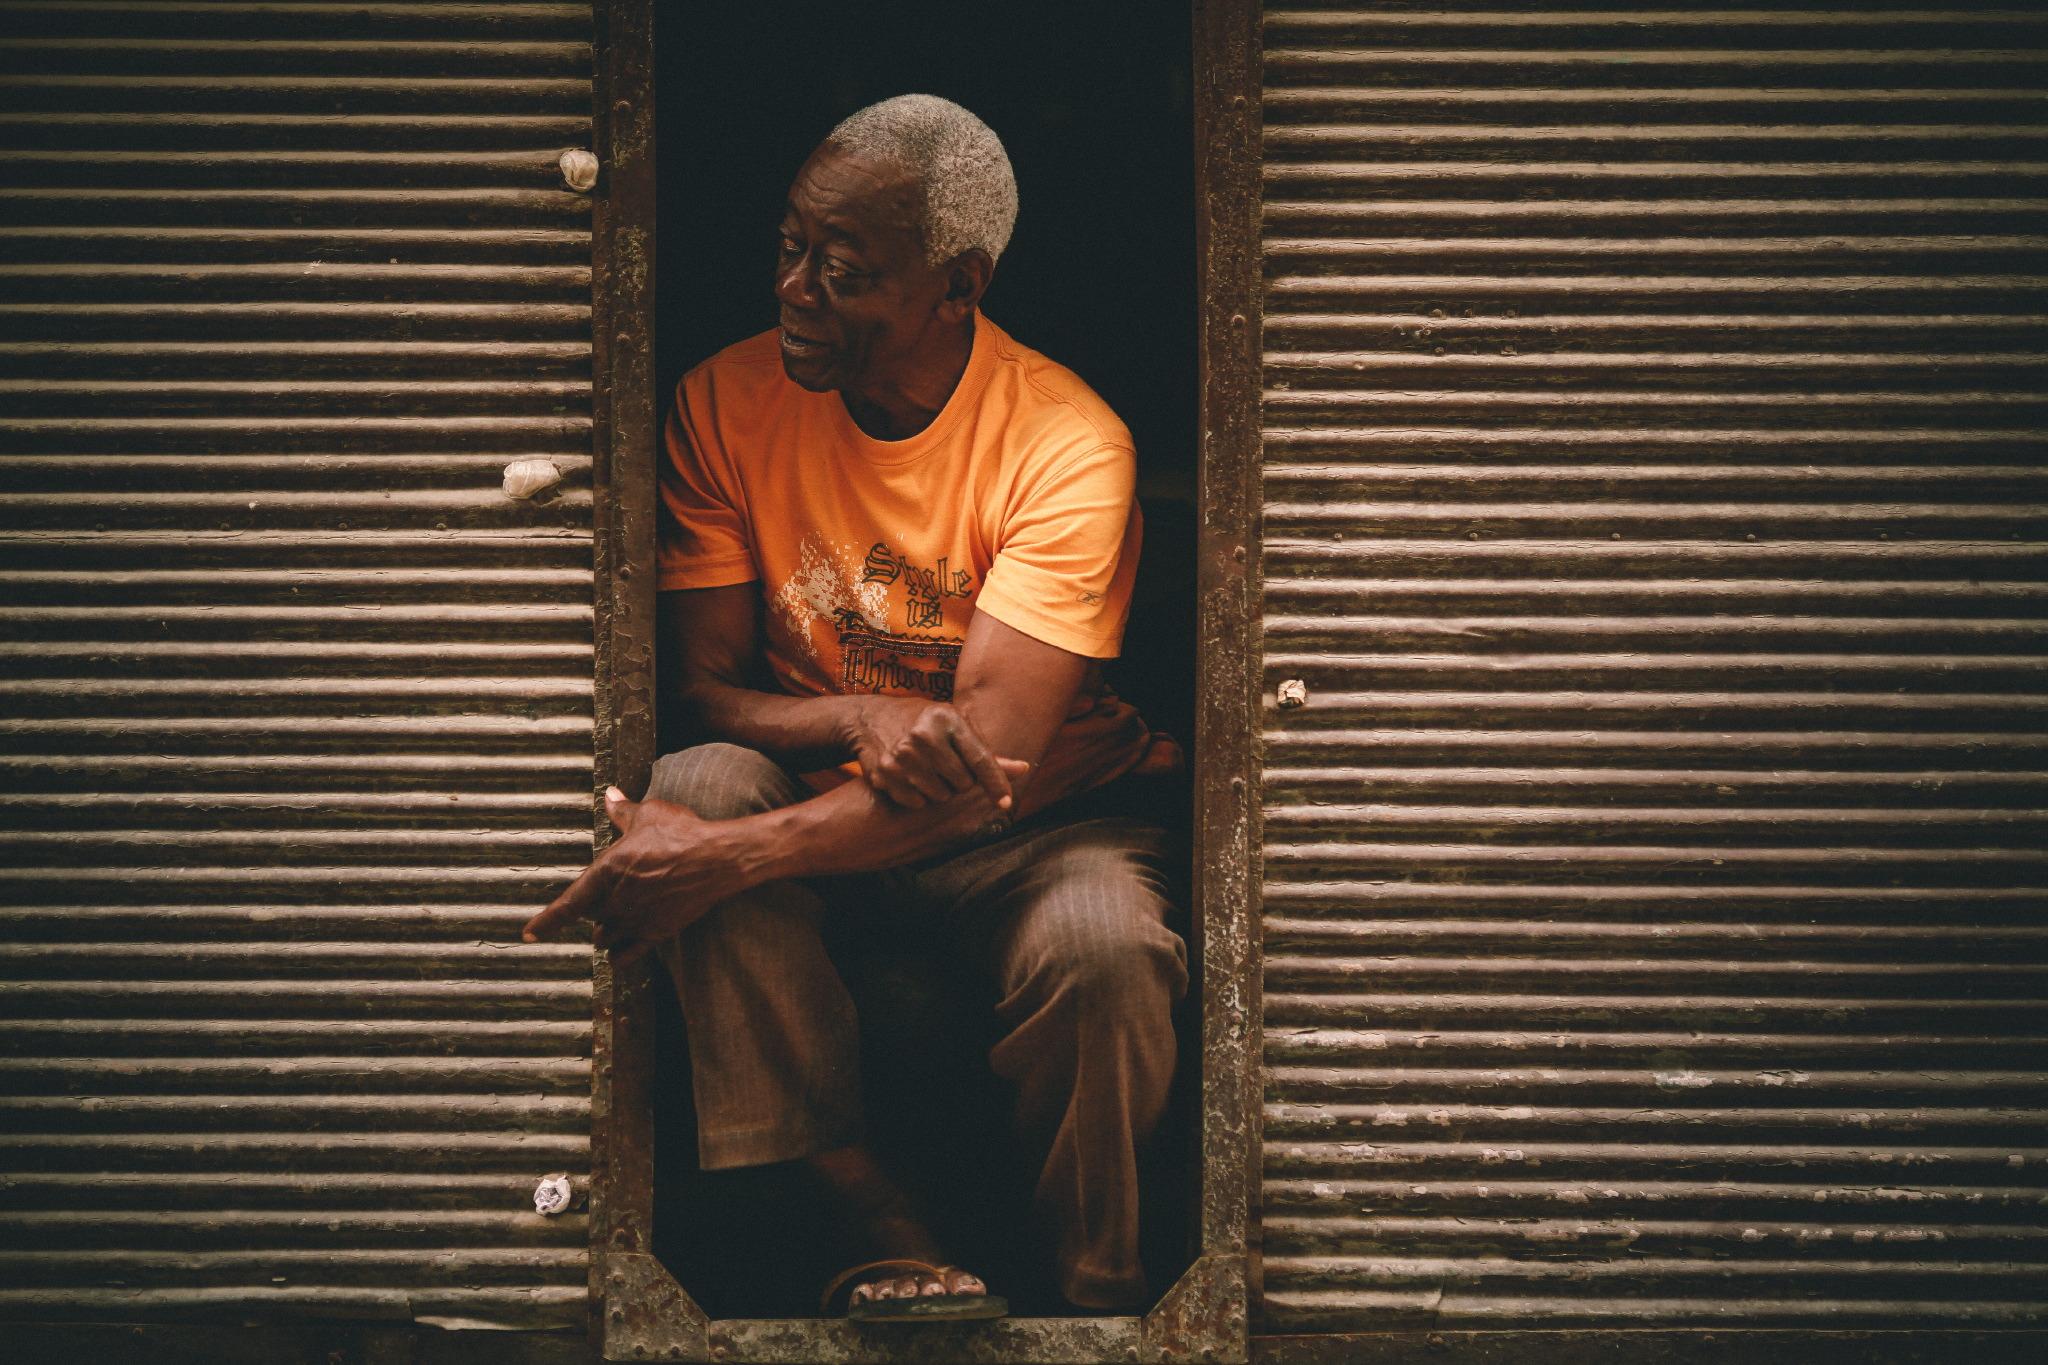 san diego wedding   photographer | man with graying hair in orange shirt standing in metal gate